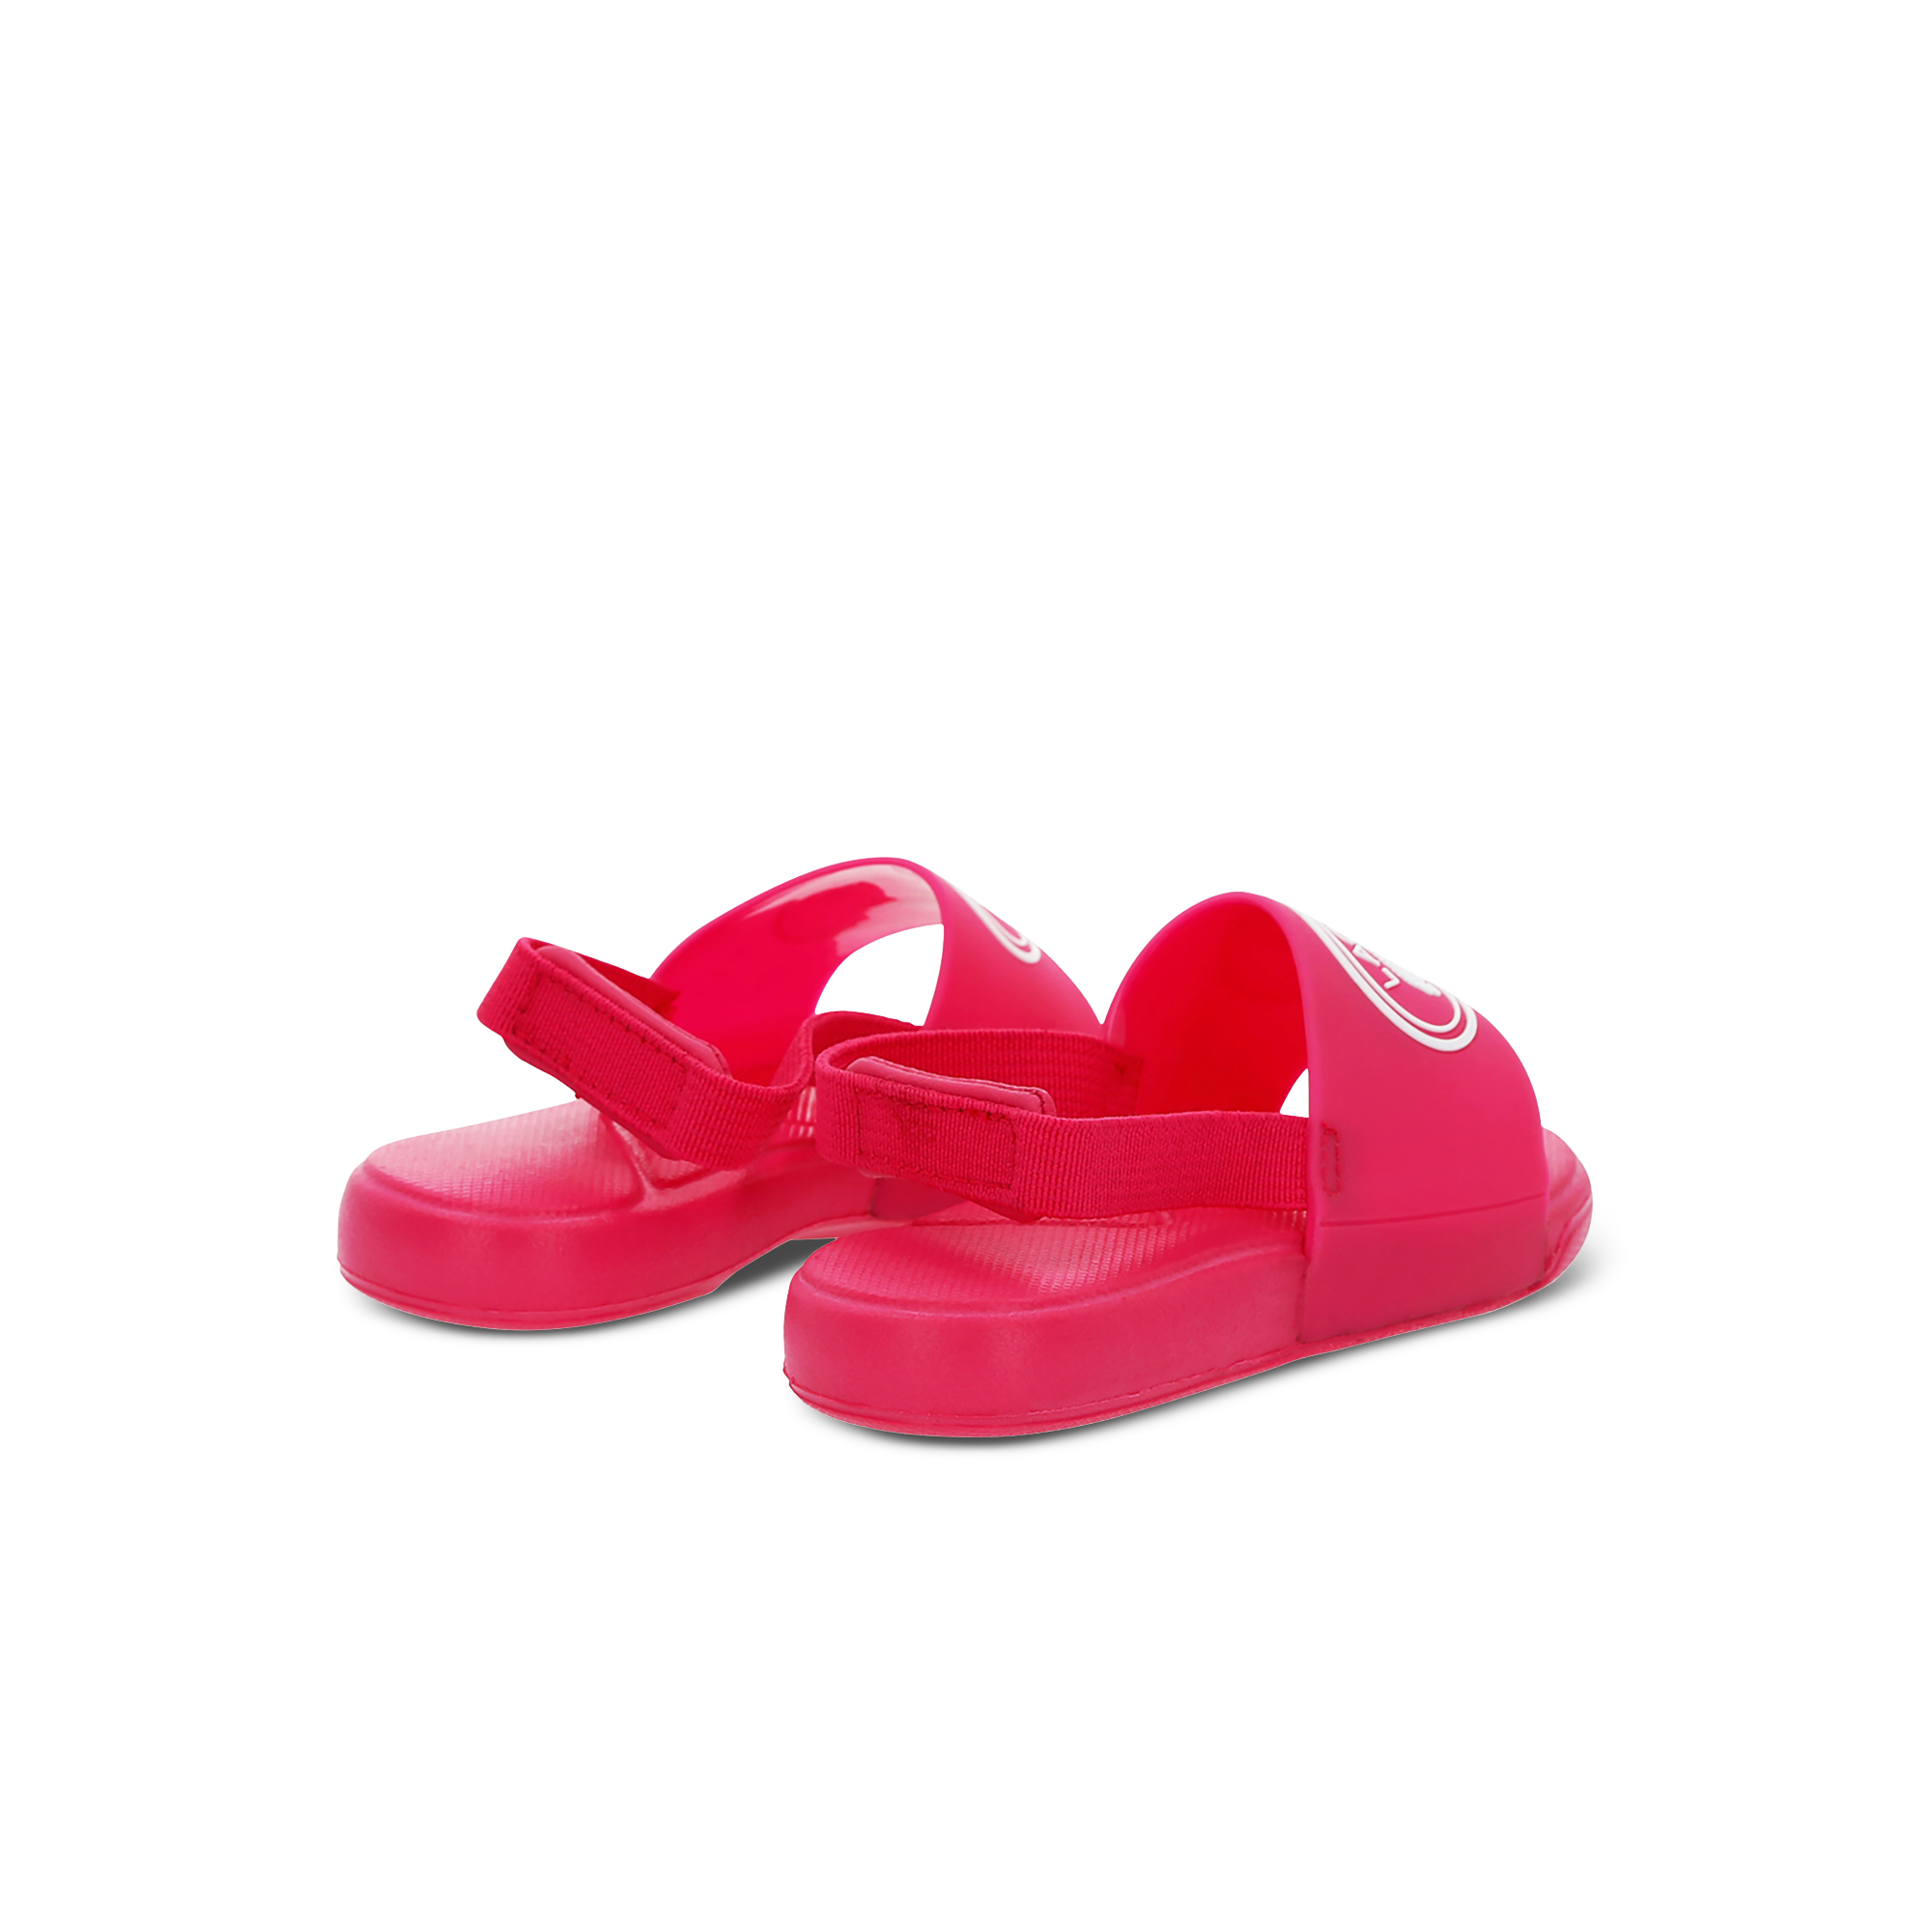 Lacoste Çocuk Koyu Pembe - Beyaz L.30 Slide 119 1 Sandalet